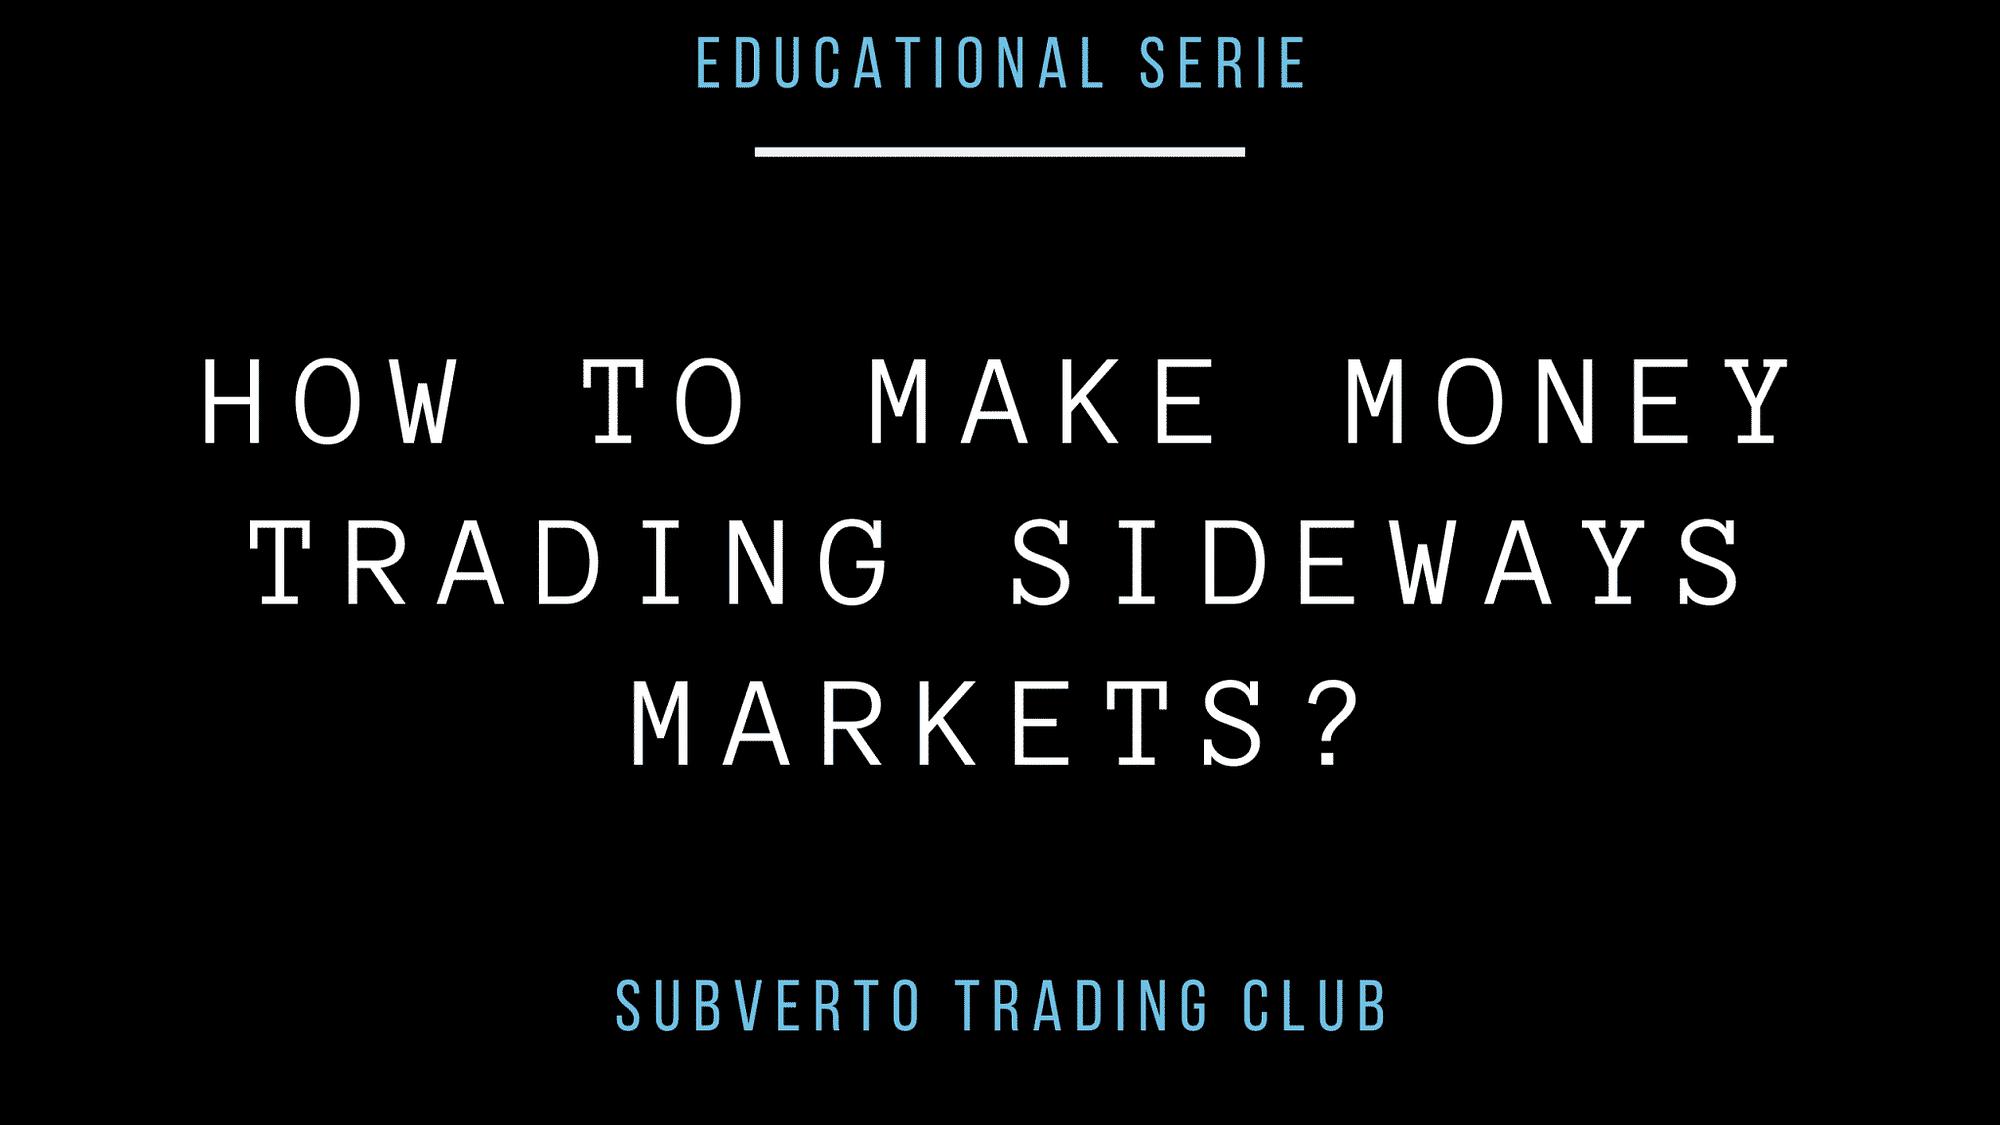 Bitcoin how to make money trading sideways market